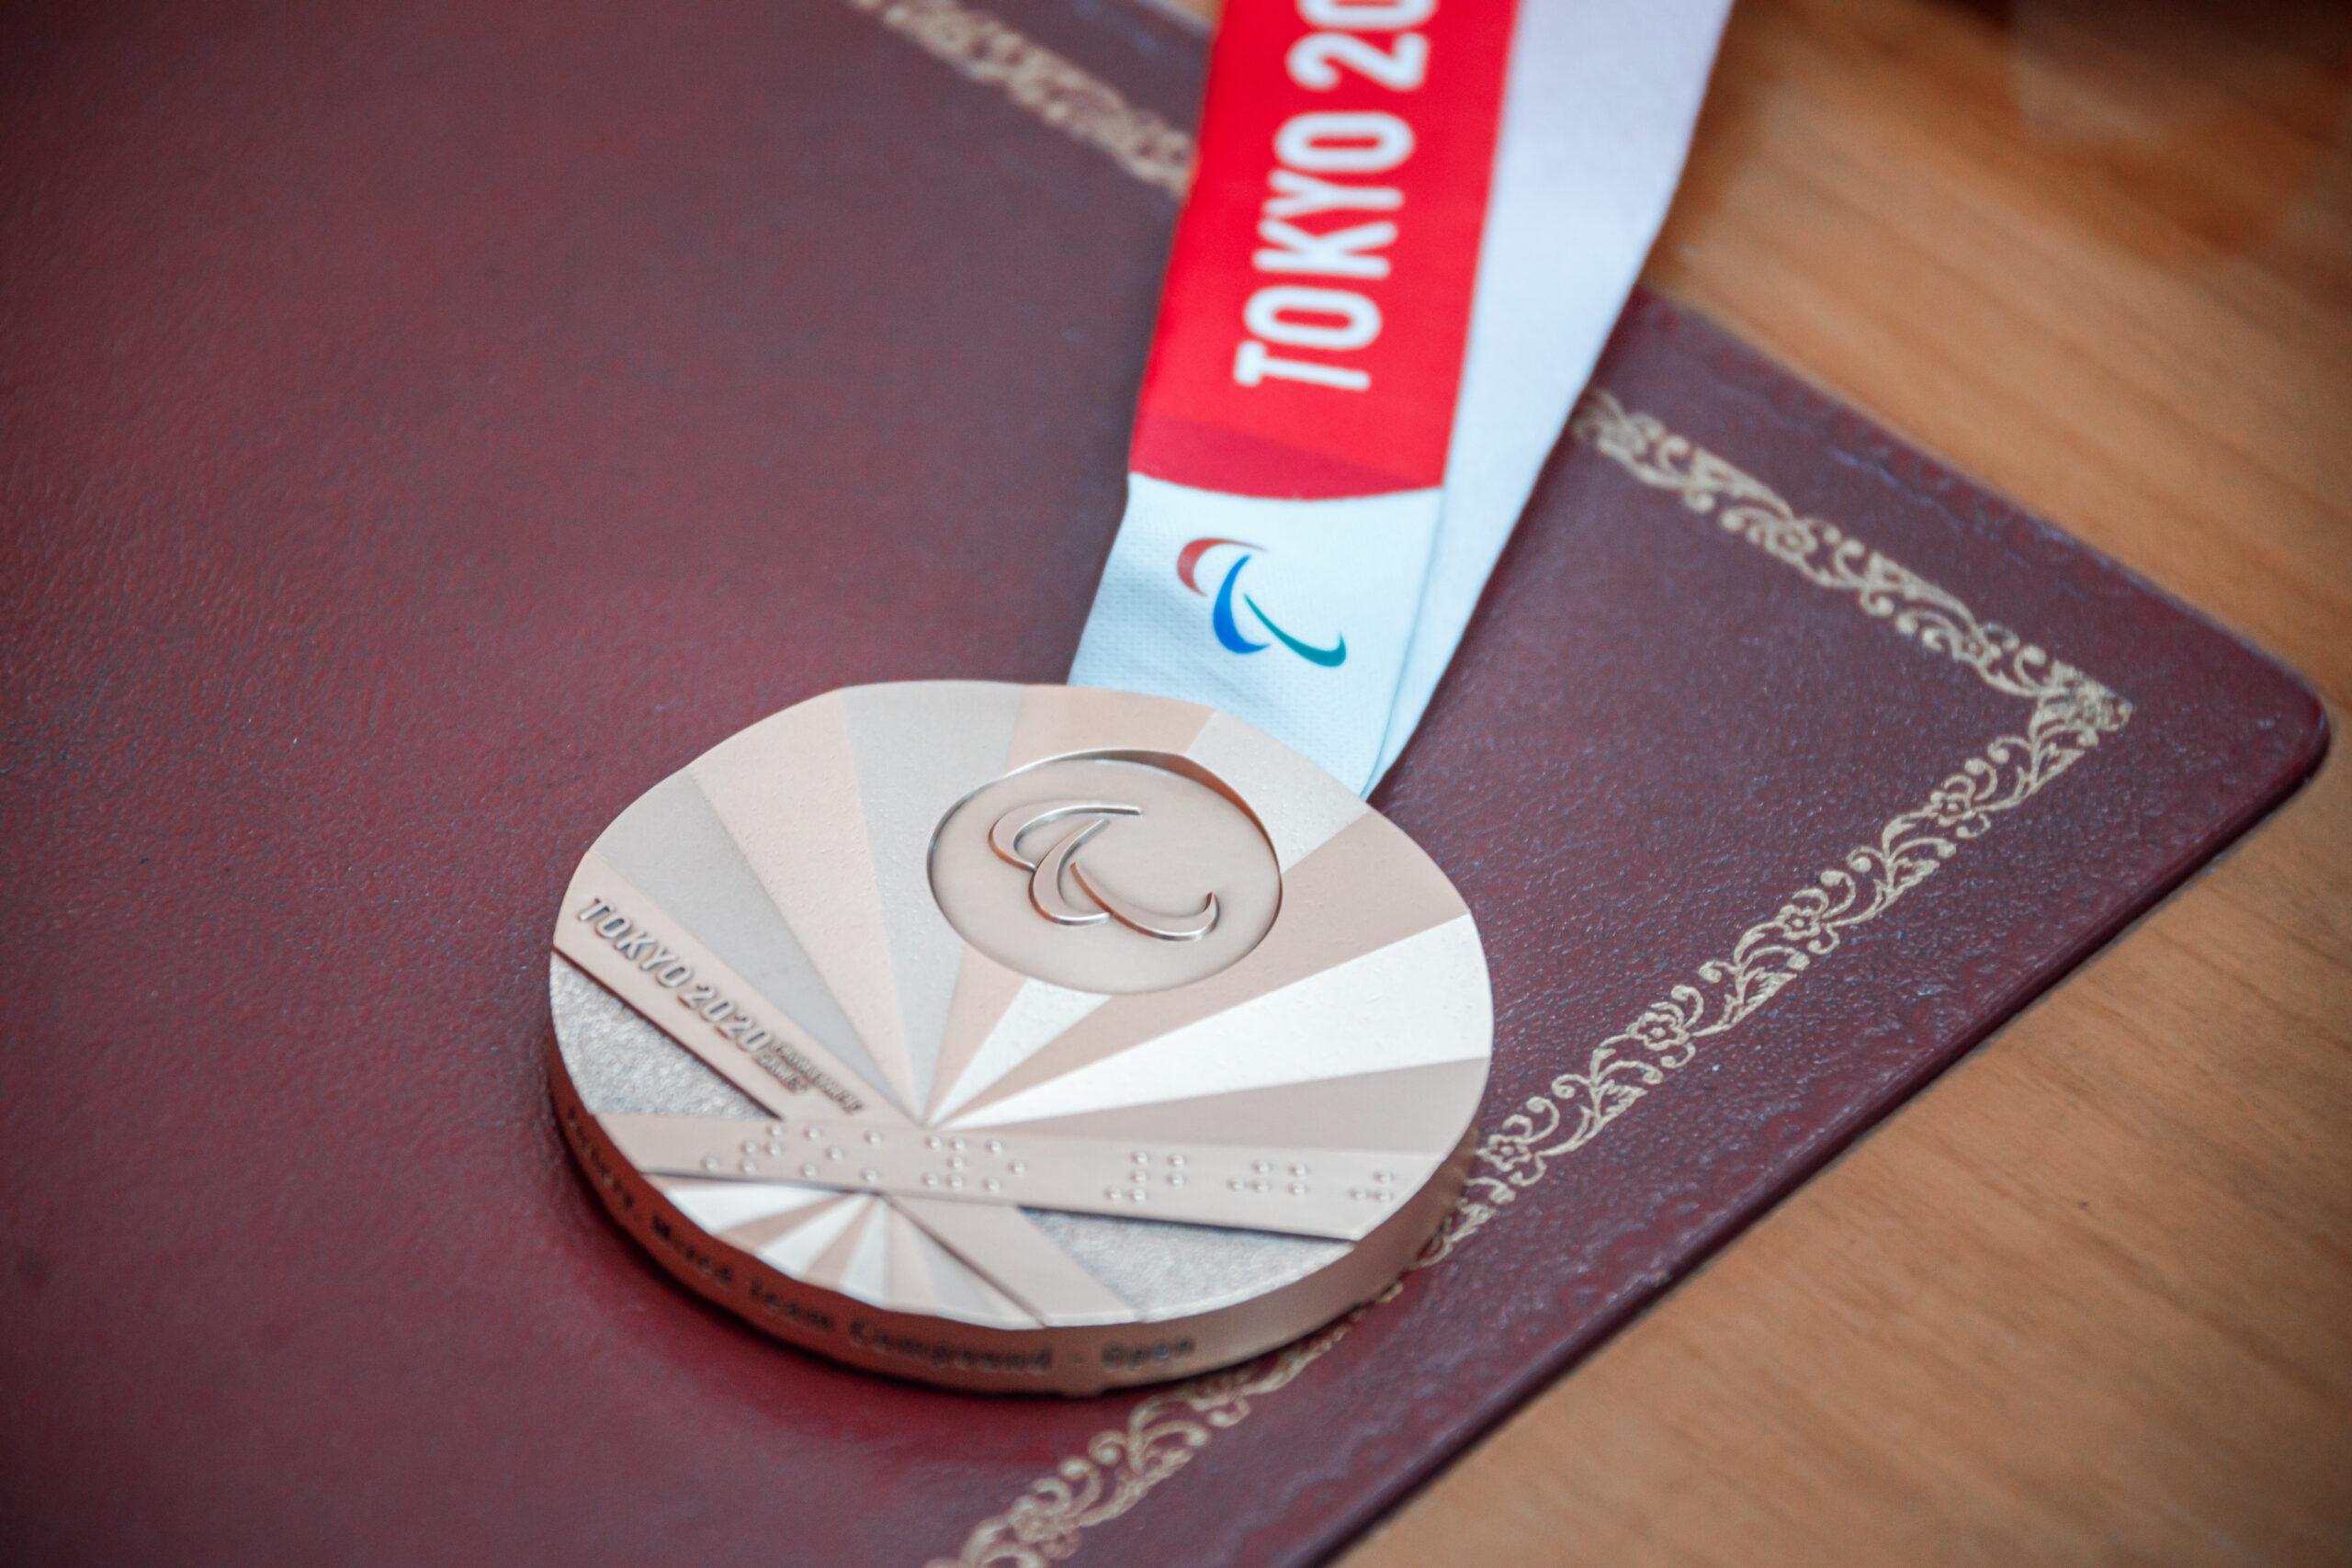 Якутских спортсменов наградили за участие в Олимпийских и Паралимпийских играх в Токио